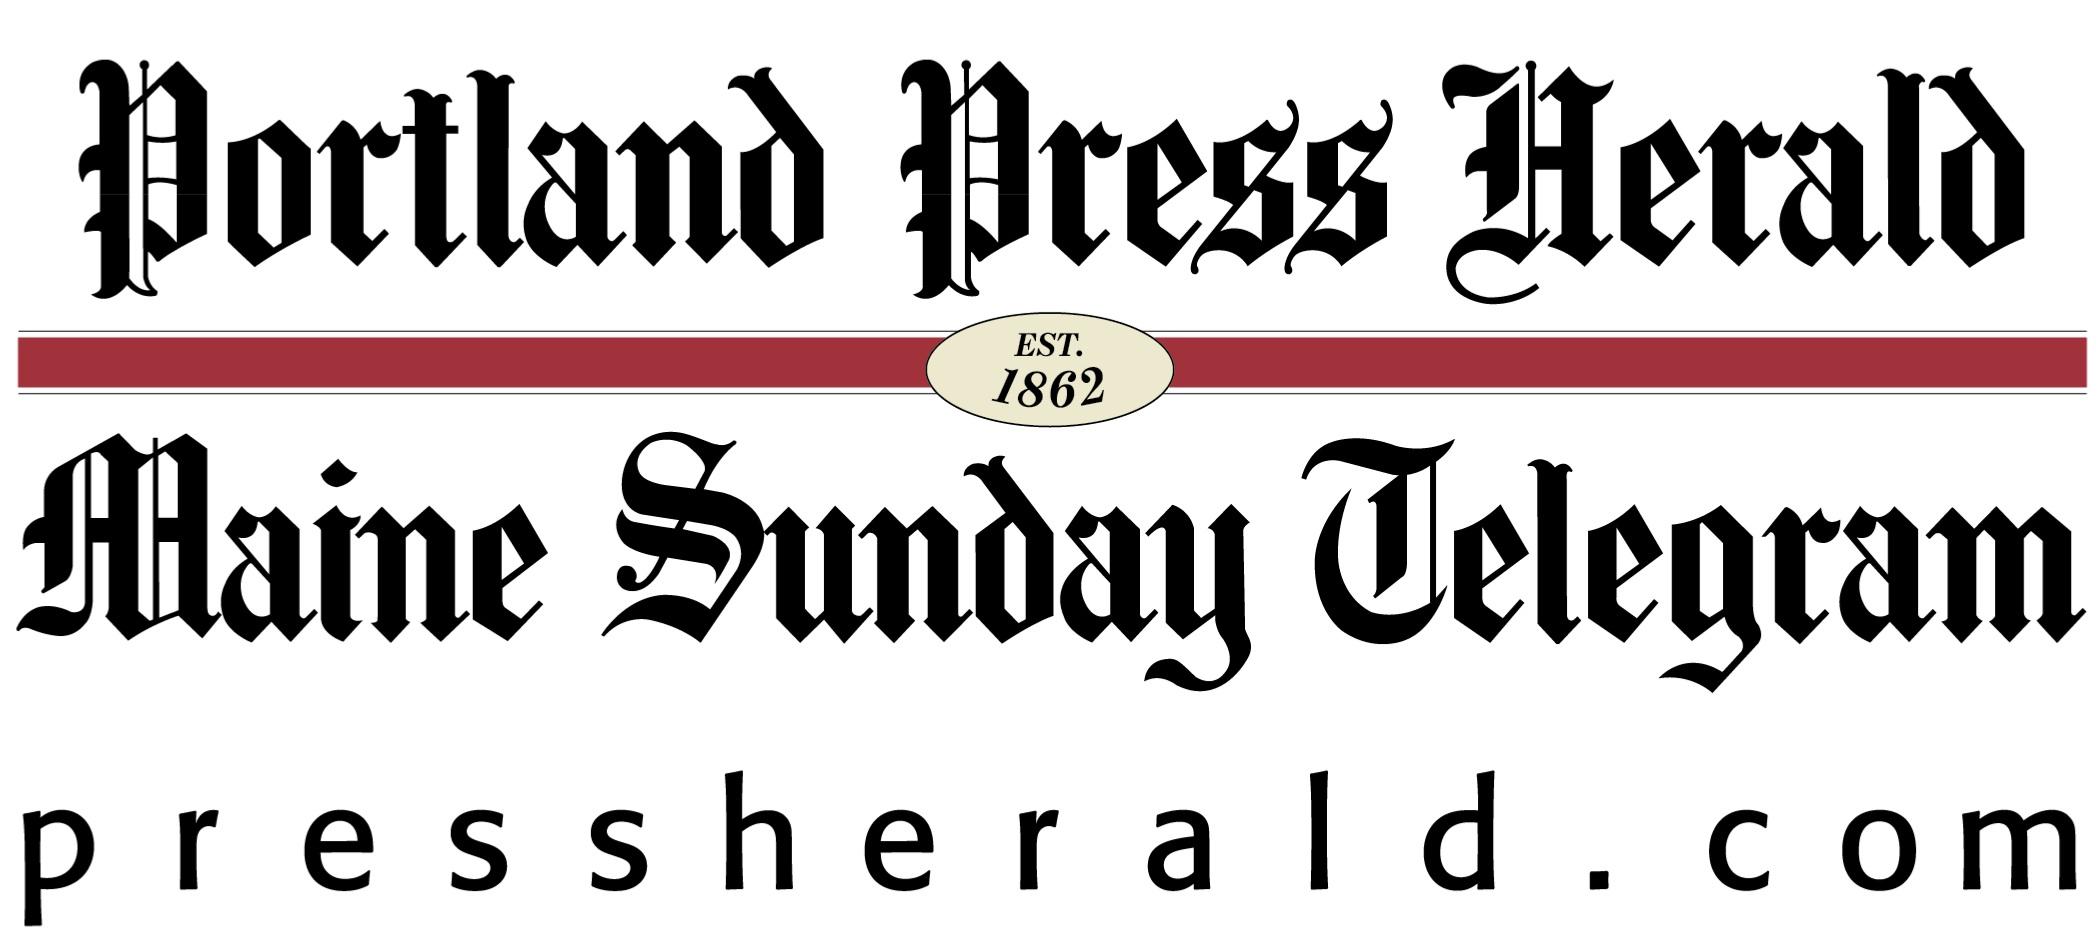 pressherald.jpg